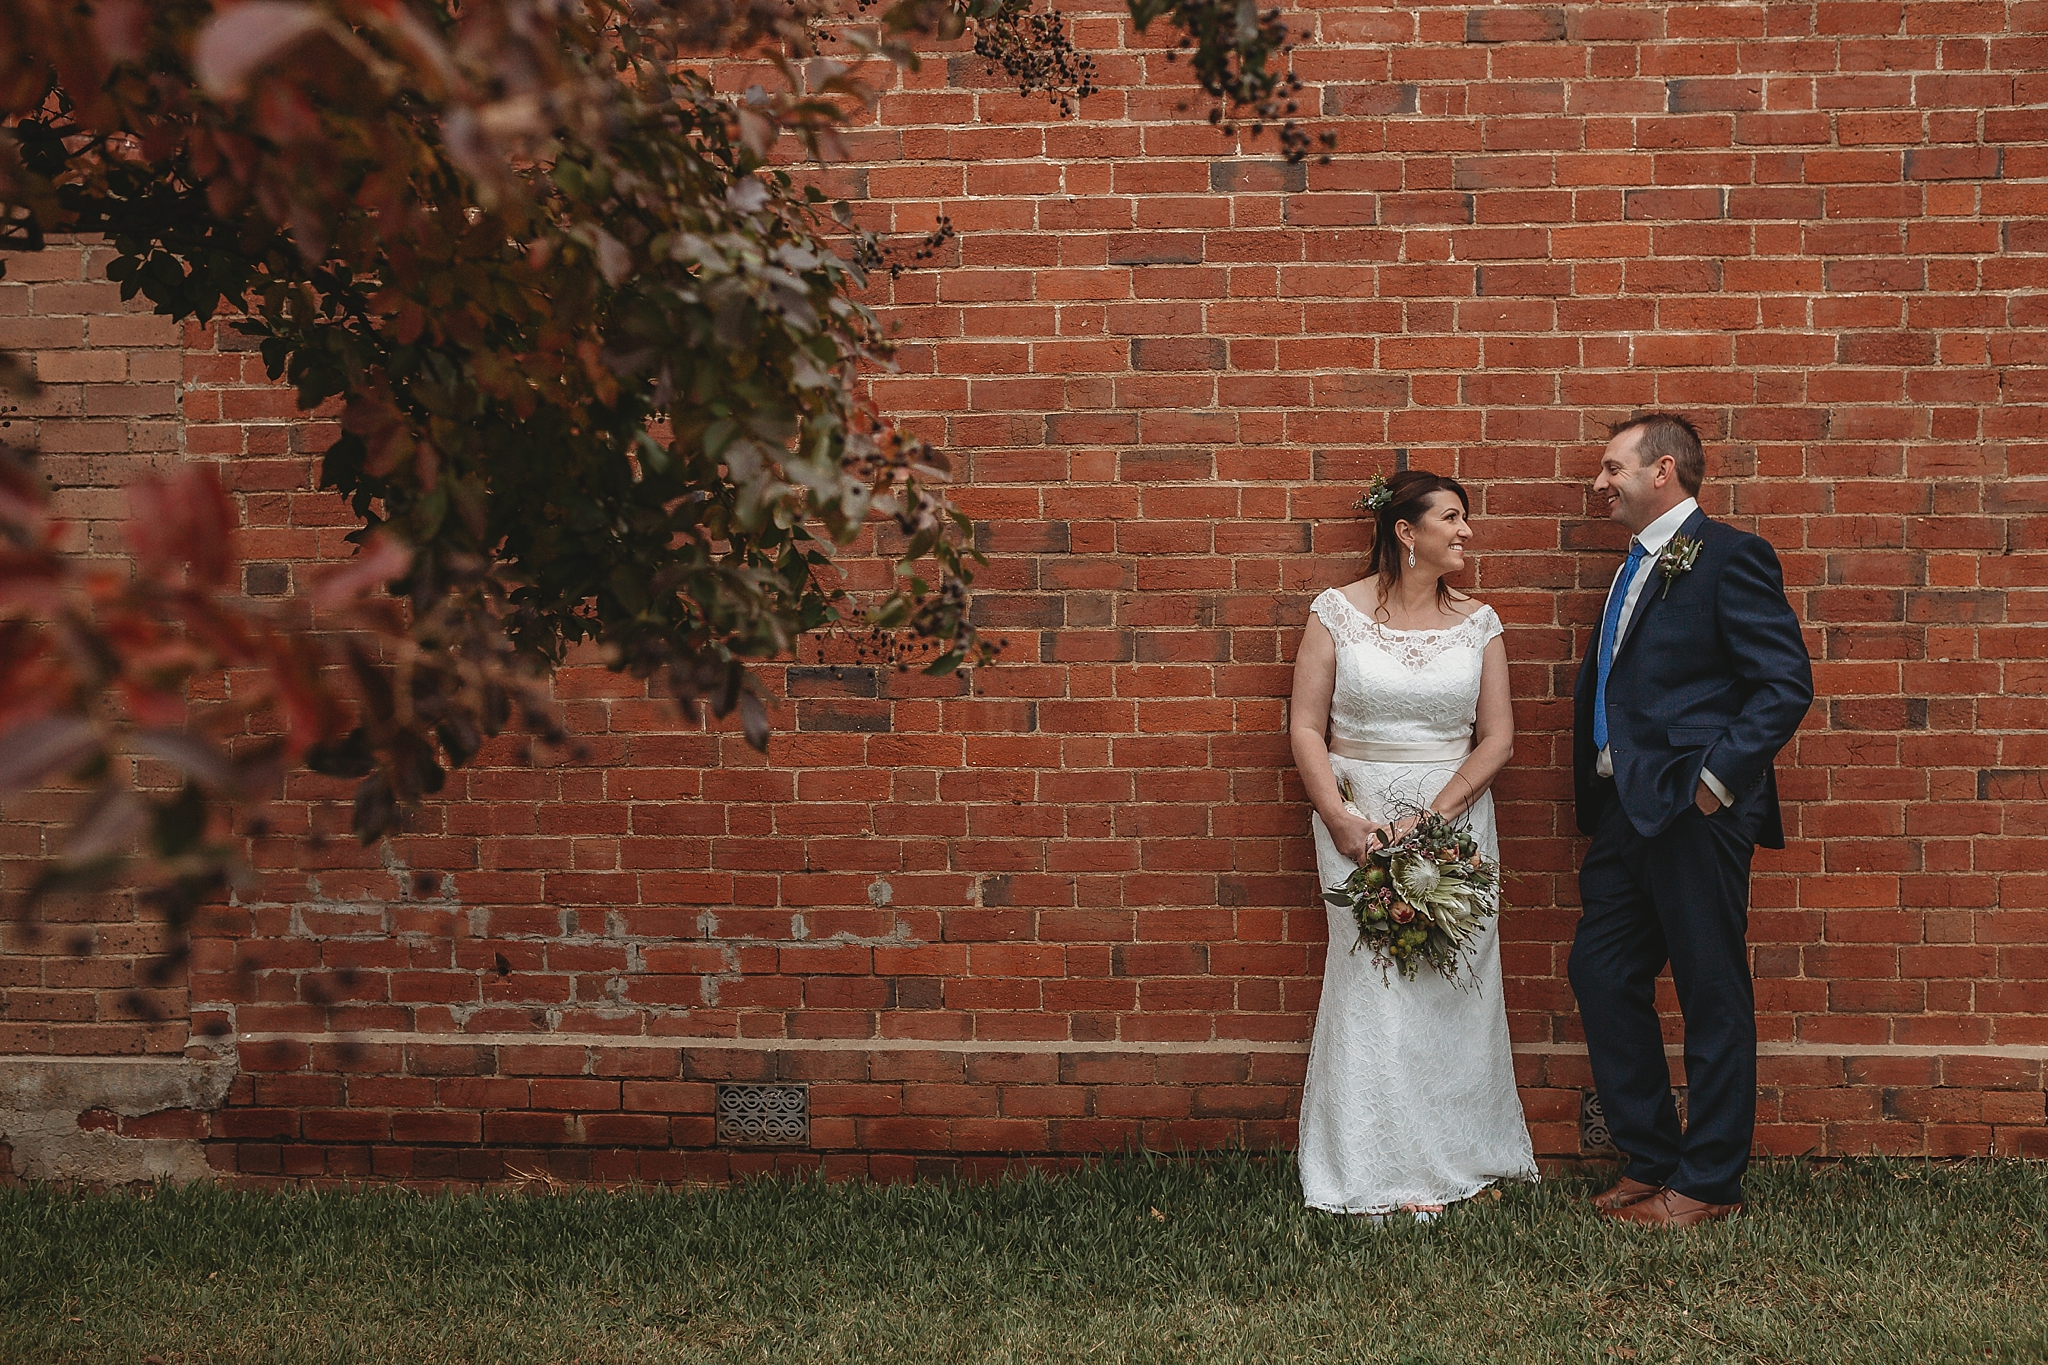 dookie bride and groom in the main street